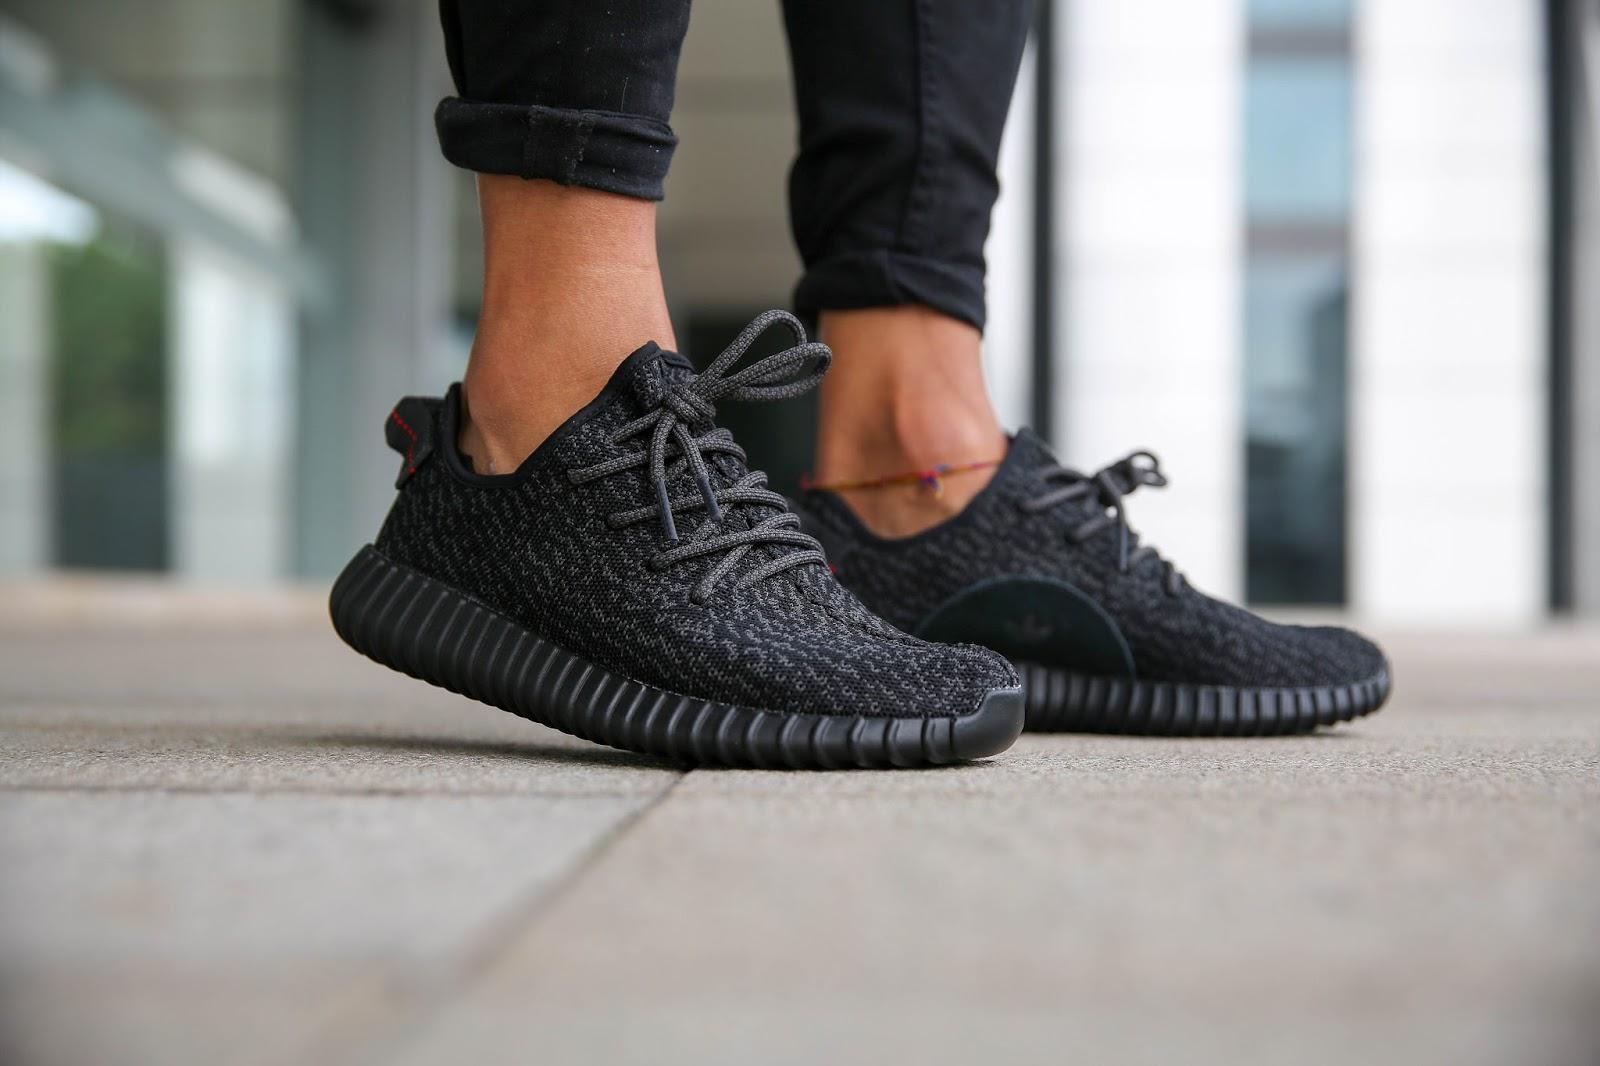 Jual Sepatu Adidas Yeezy Boost 350 Pirate Black - Everlasting Sport ... d9e174b696